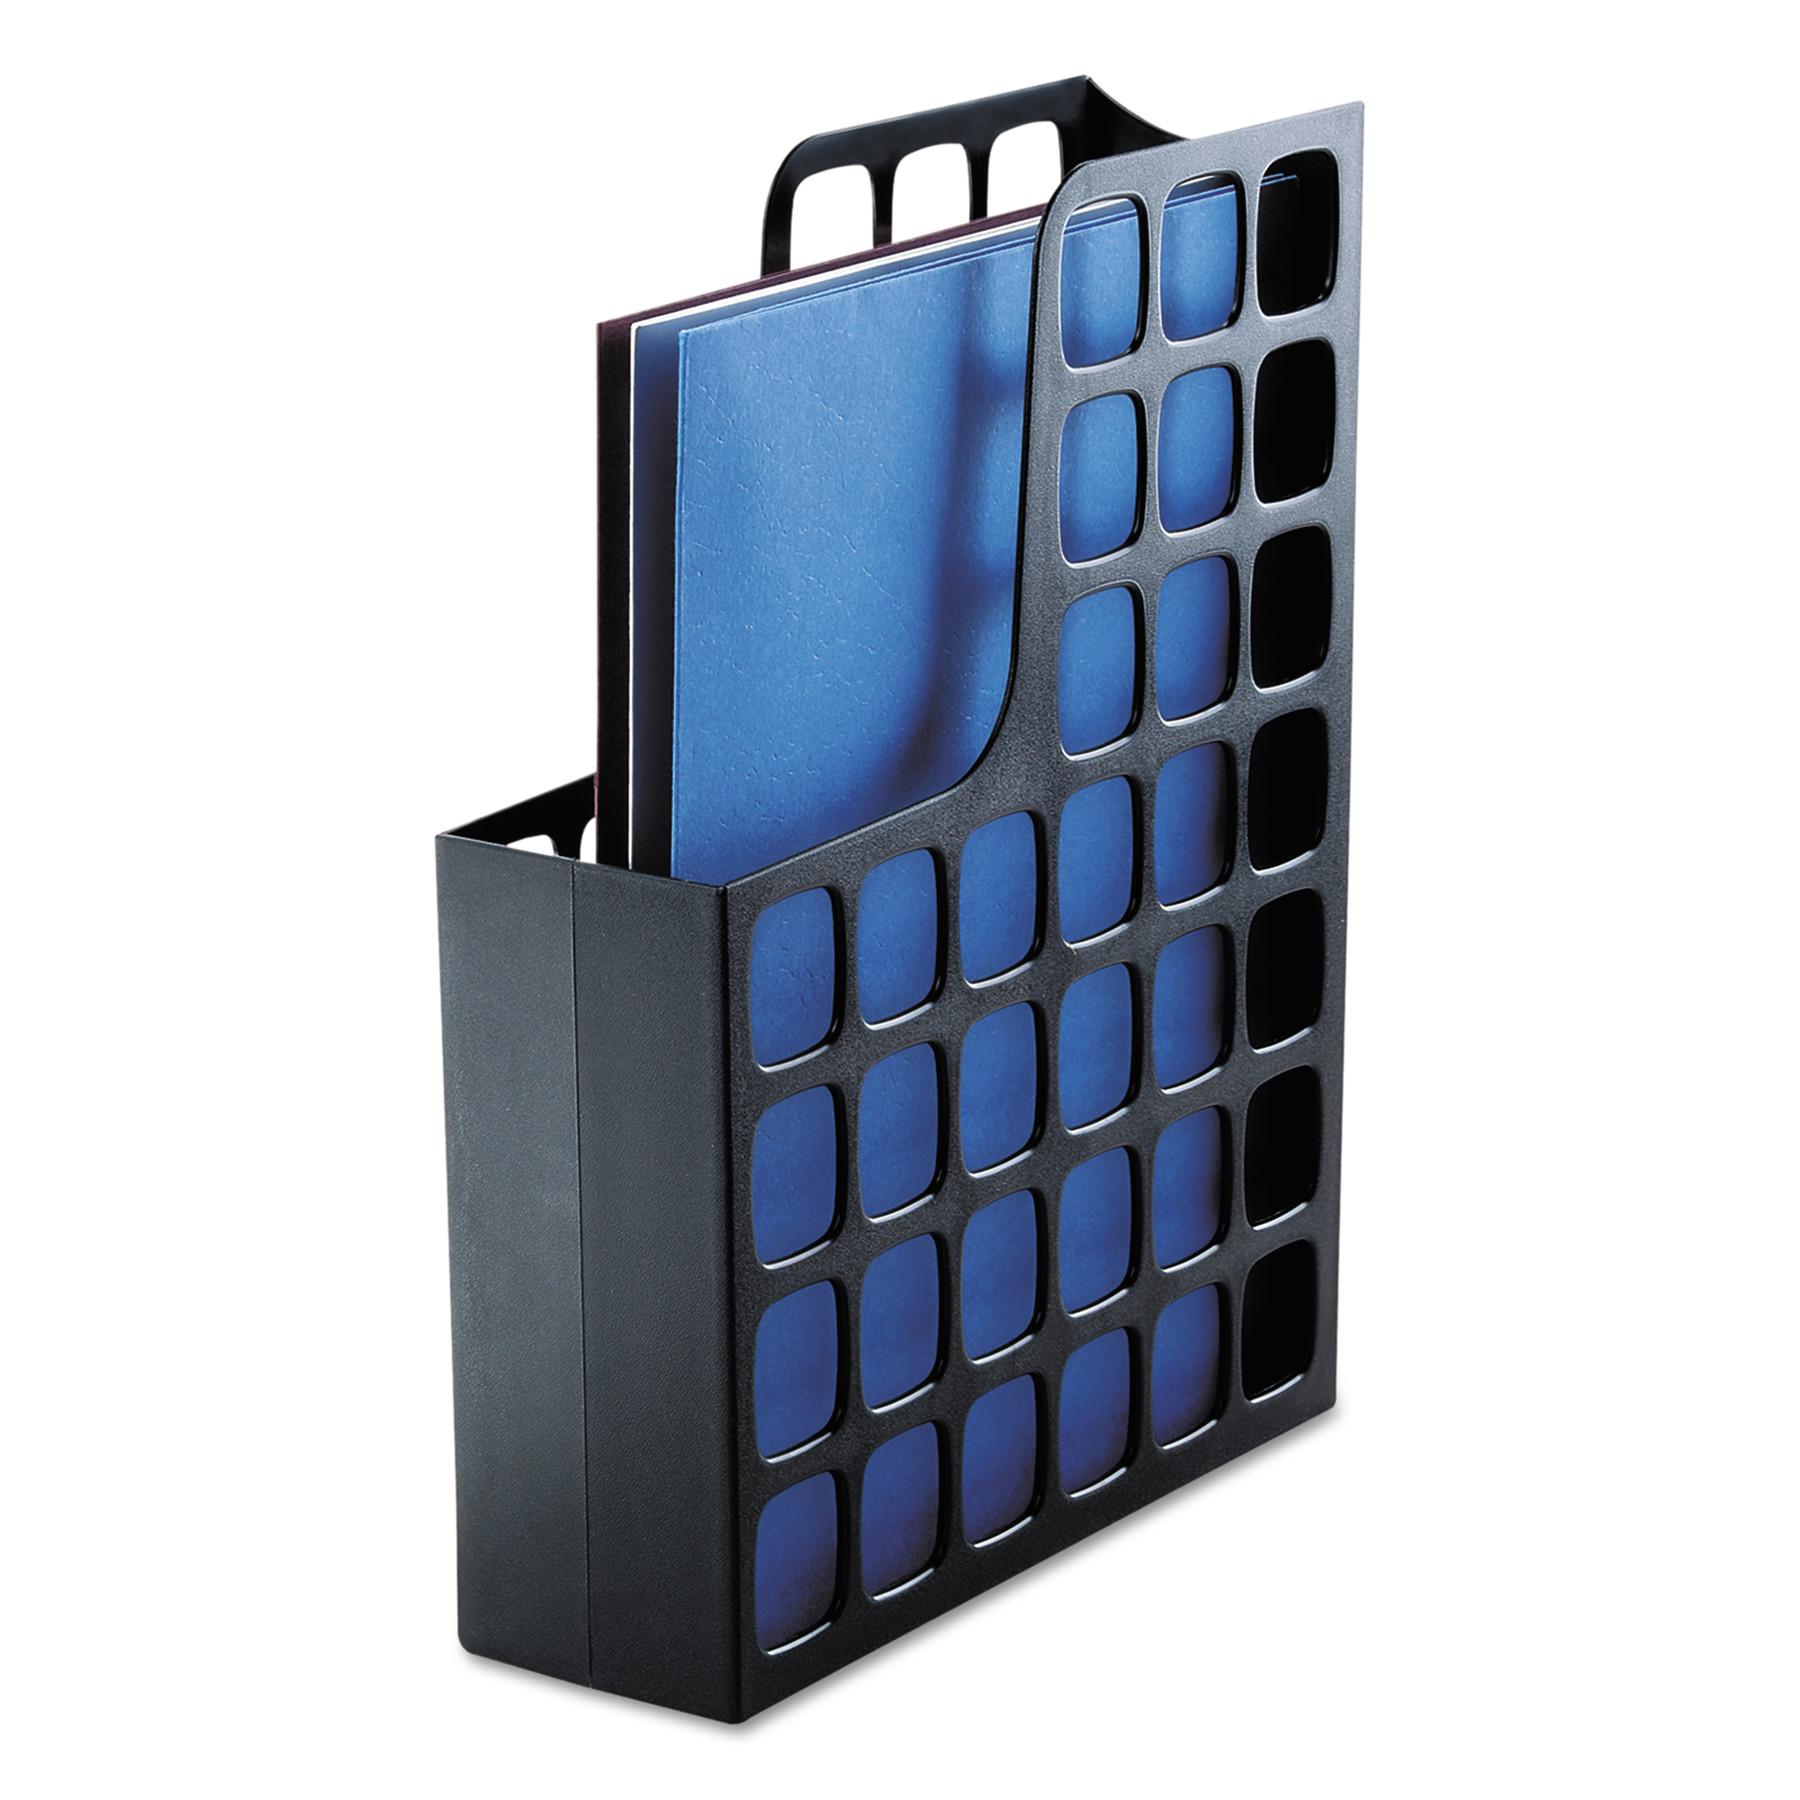 Pendaflex Plastic Magazine File, 3 x 9 1/2 x 12 1/2, Black